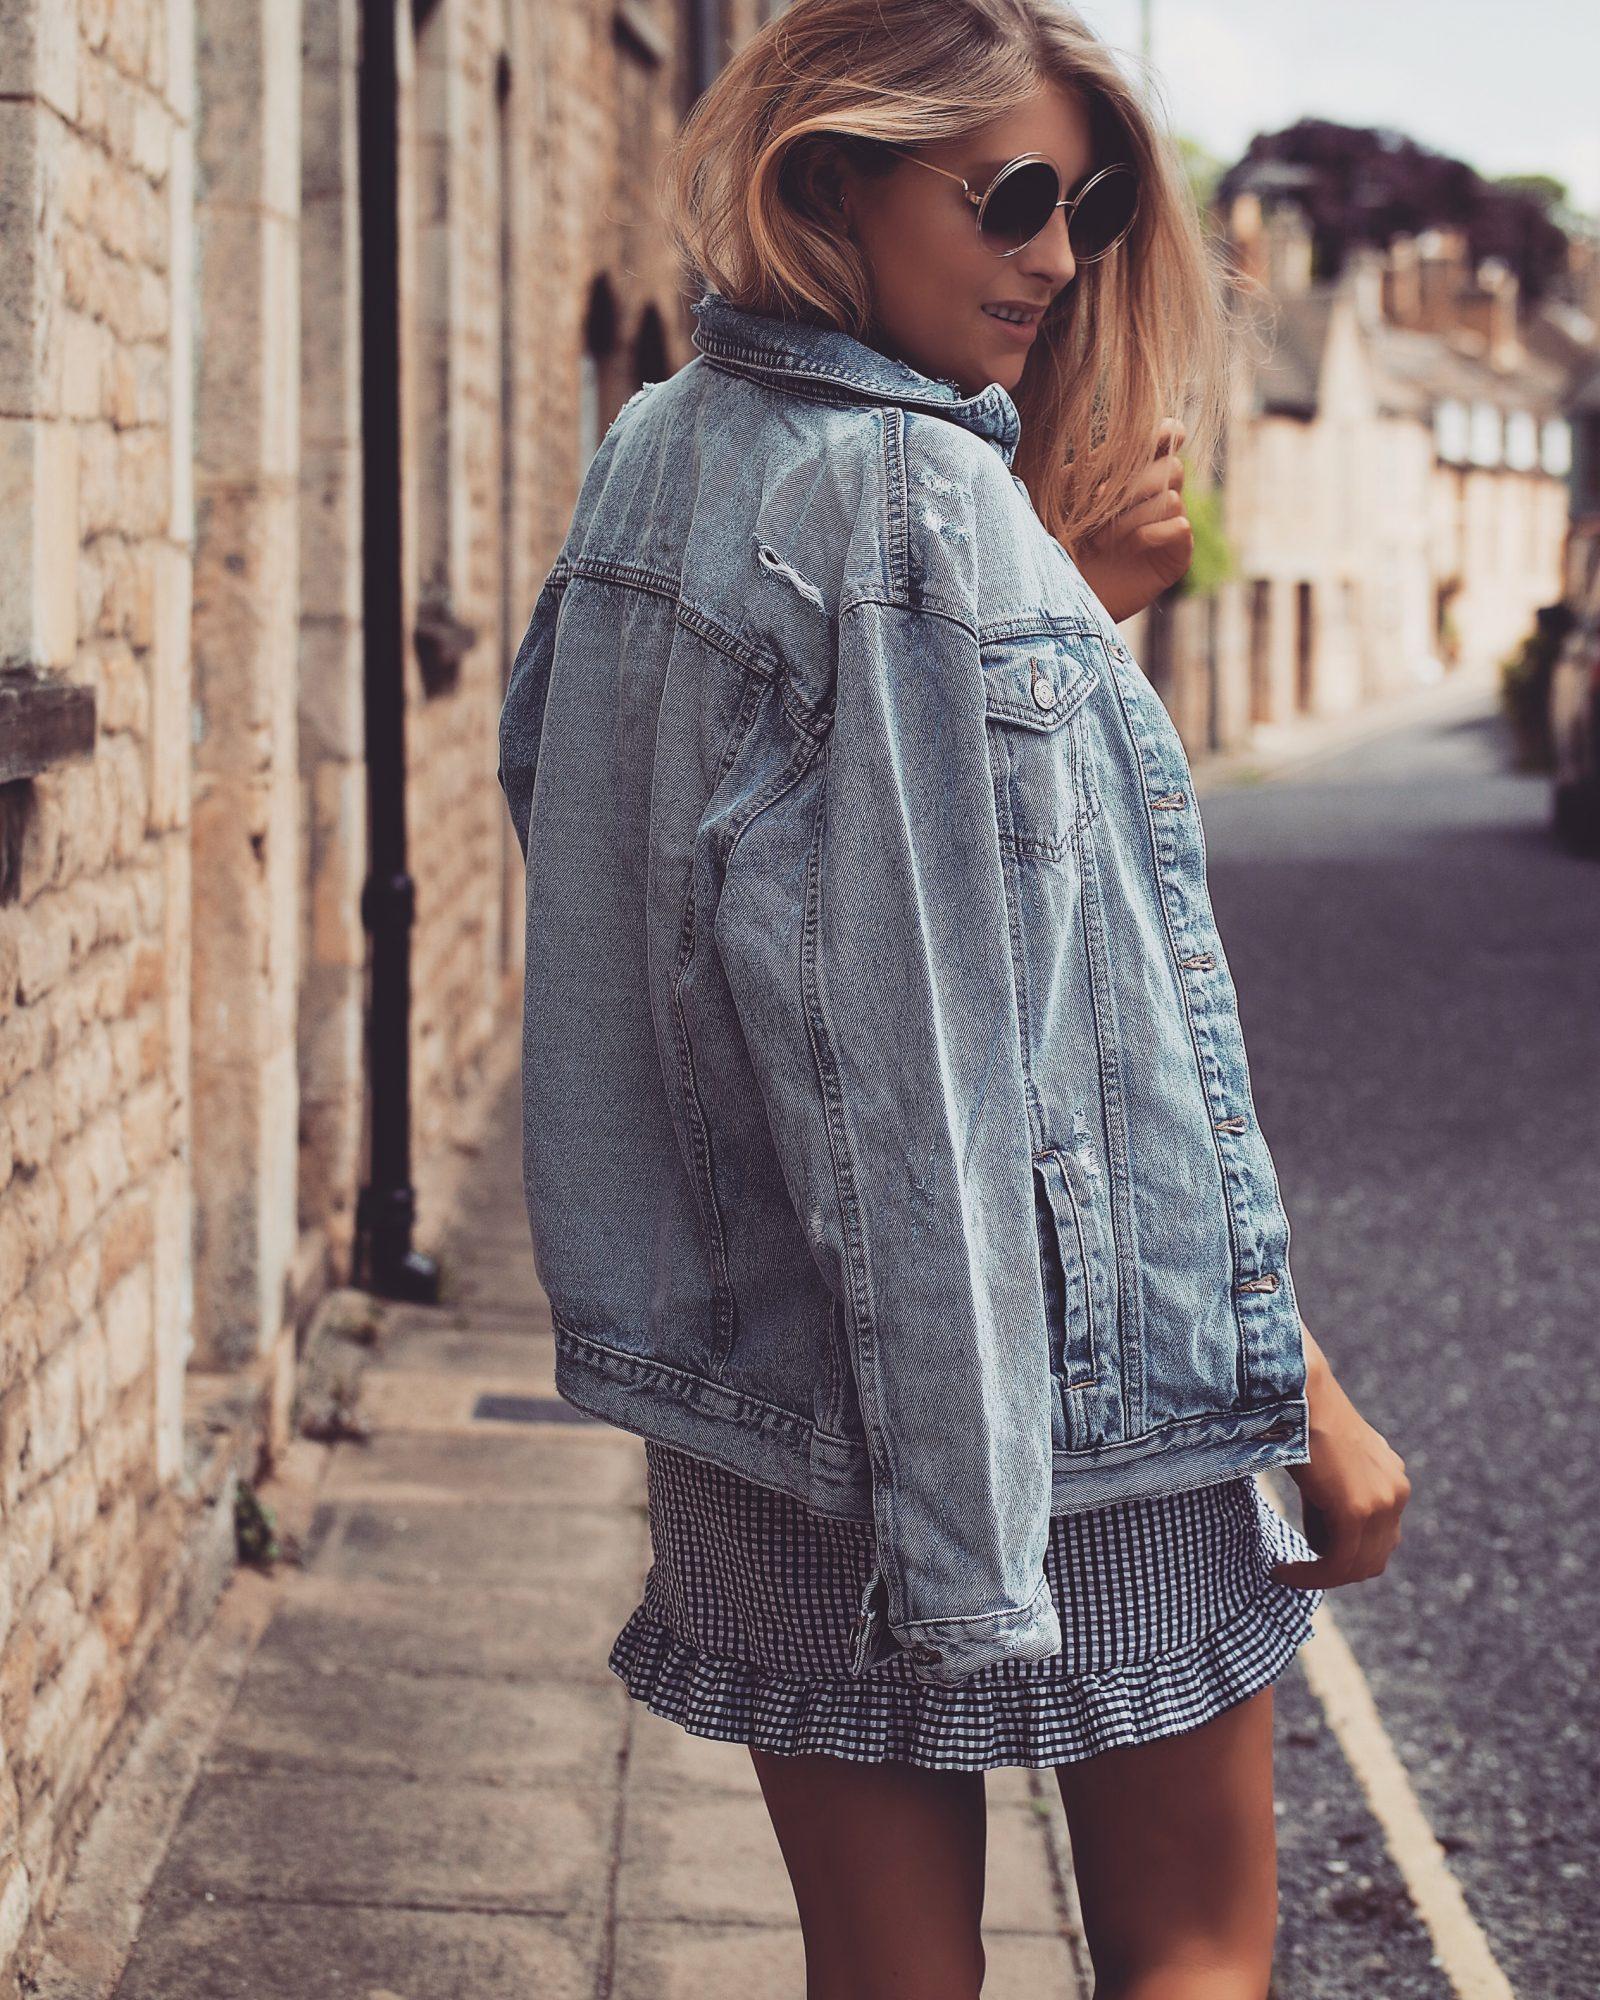 Summer BBQ Style - Oversized Denim Jacket